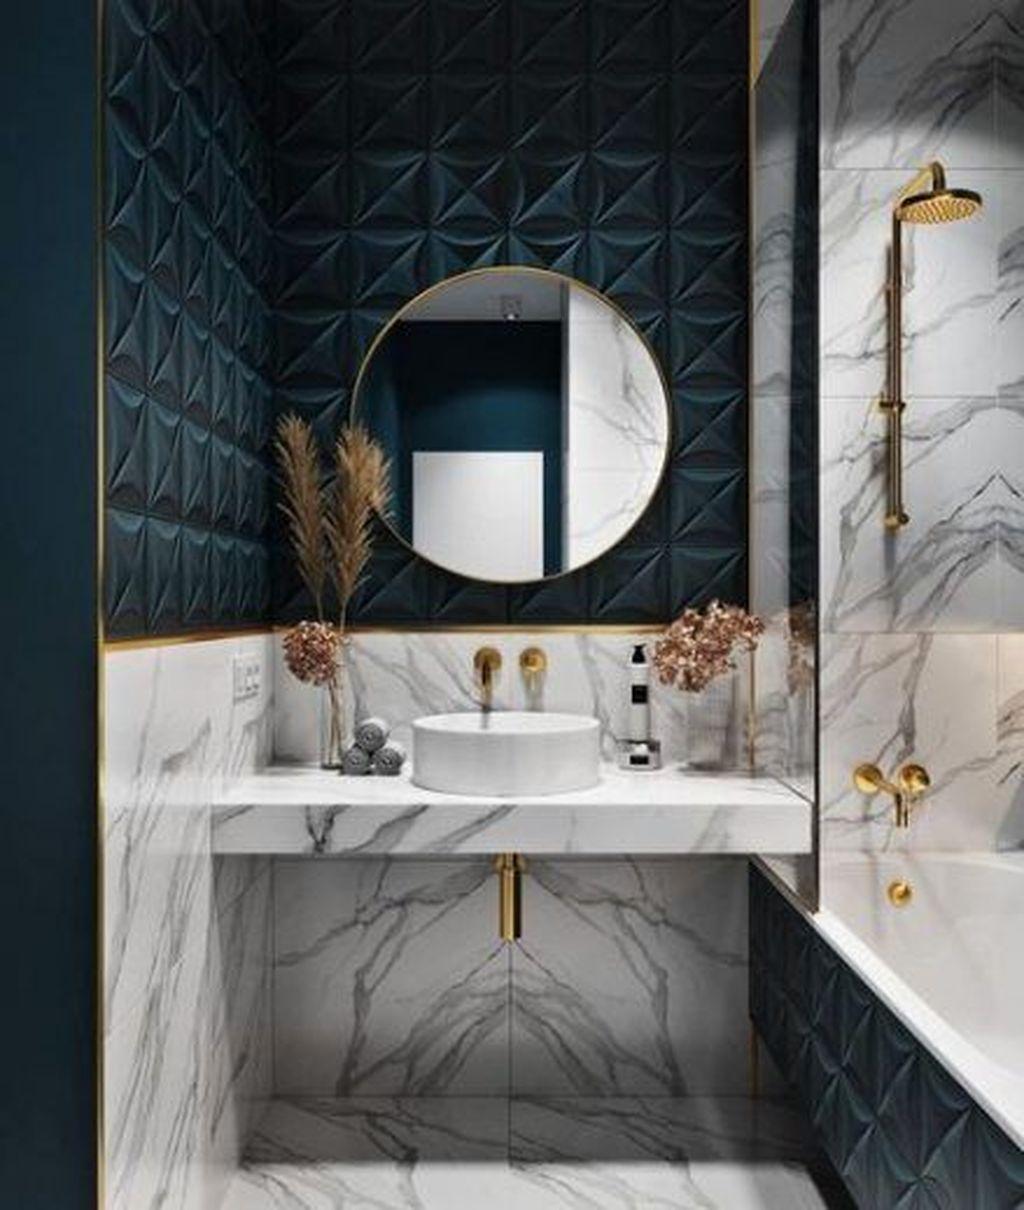 Inspiring Black Powder Room Design Ideas With Modern Style 01